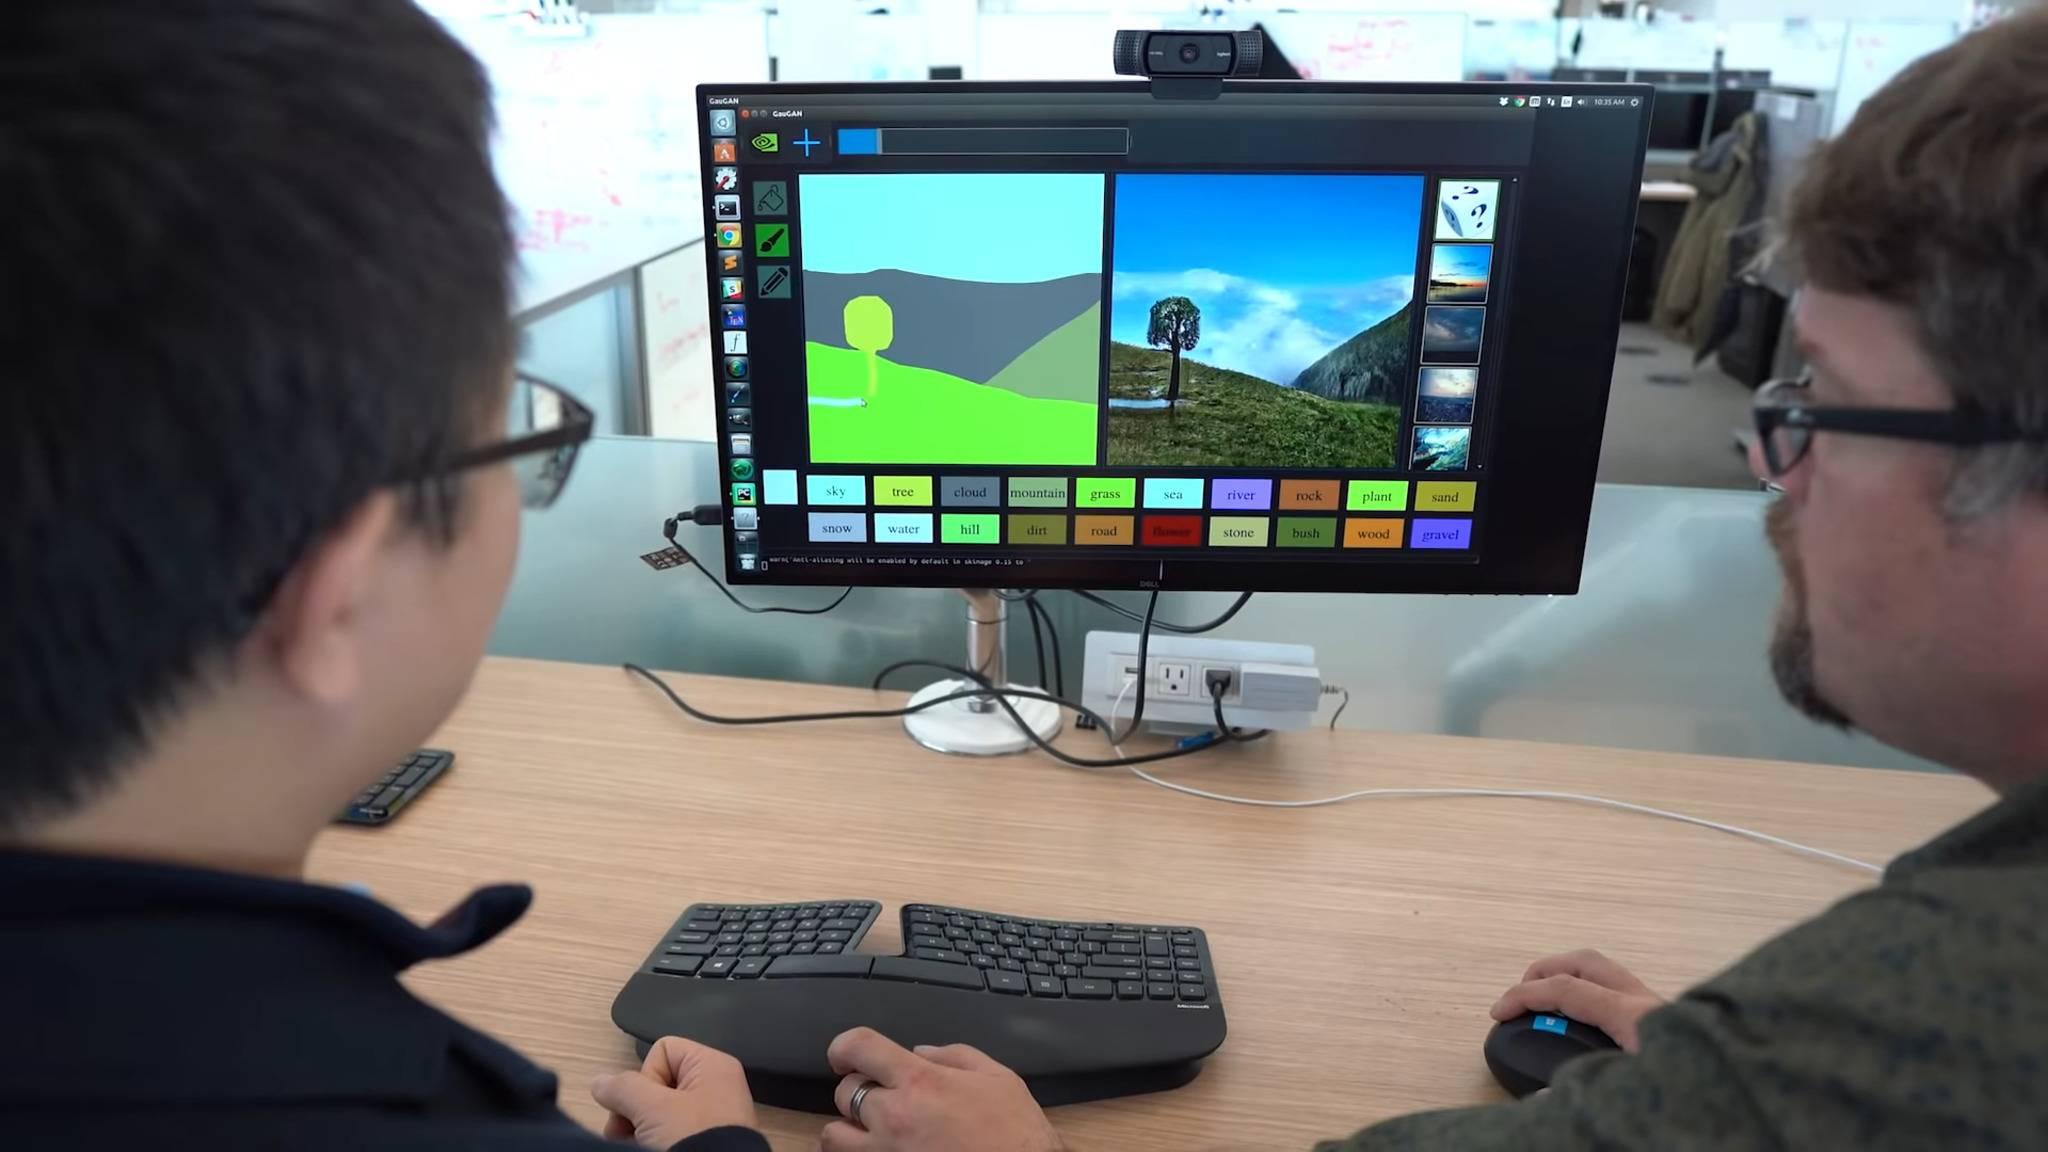 Nvidia-KI verwandelt Skizzen in Landschaftsgemälde – in Echtzeit